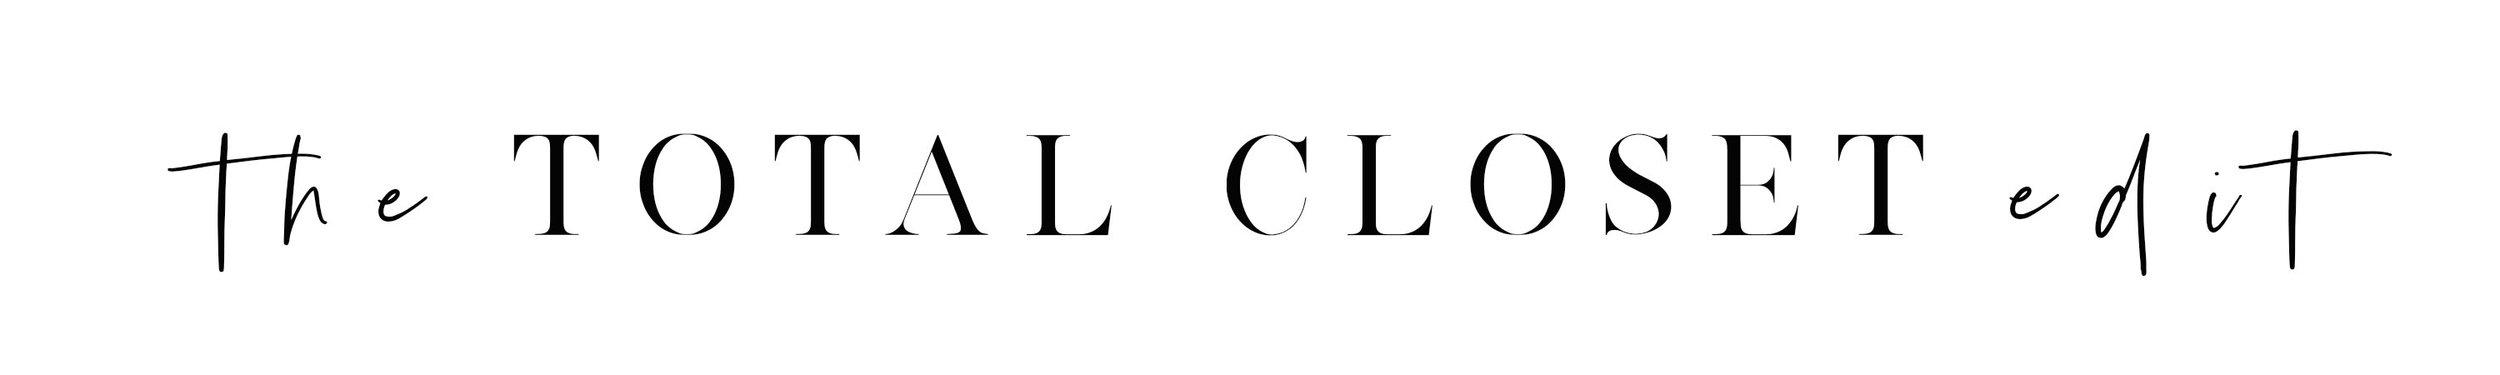 total closet edit text.jpg